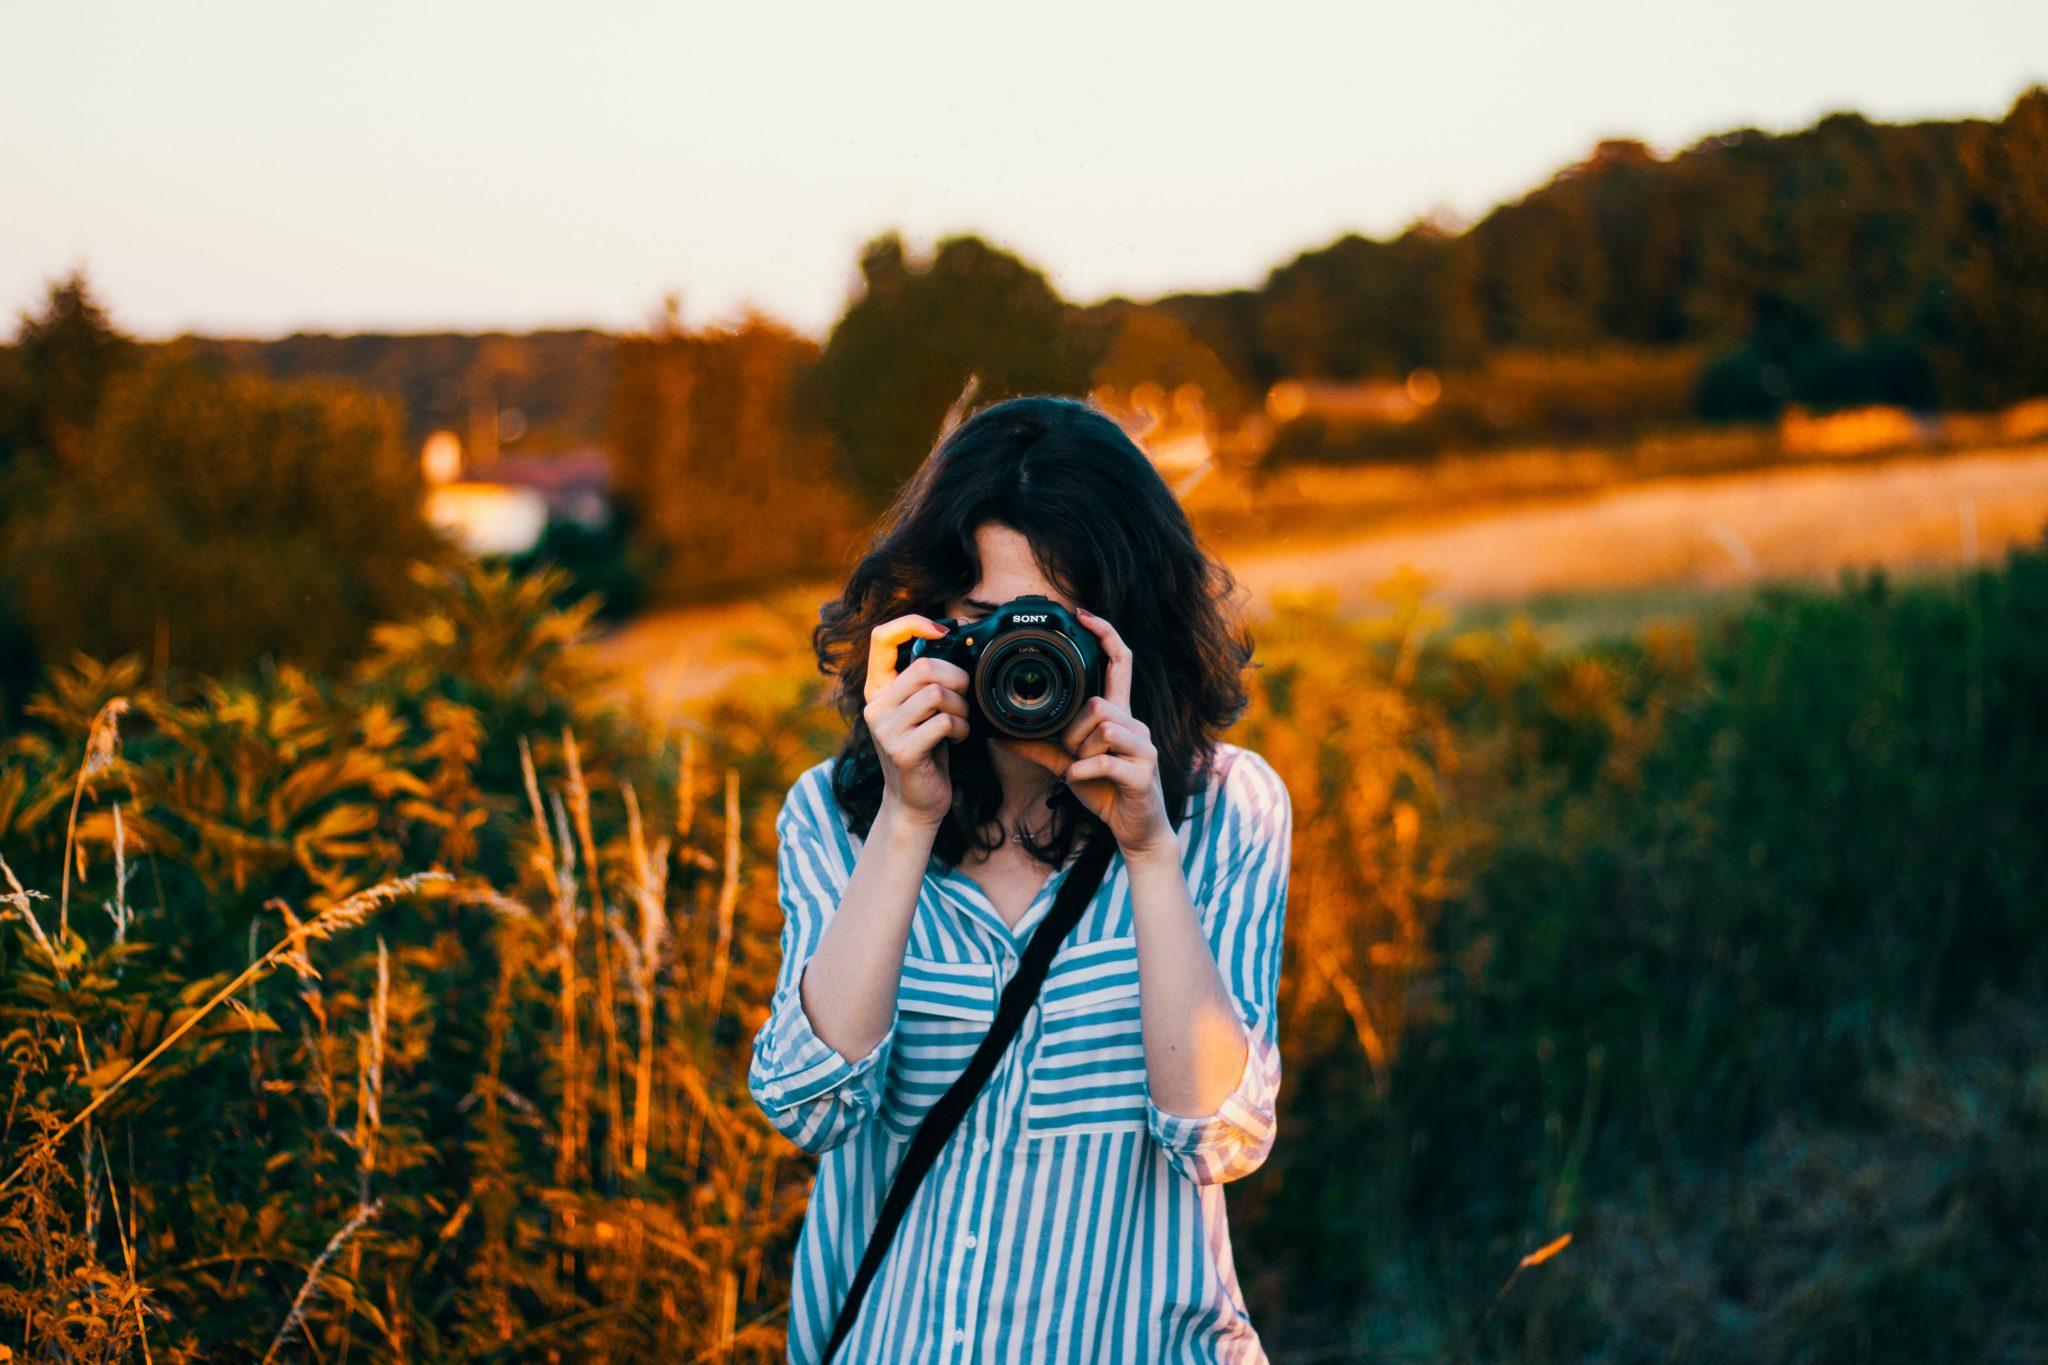 femeie face poze